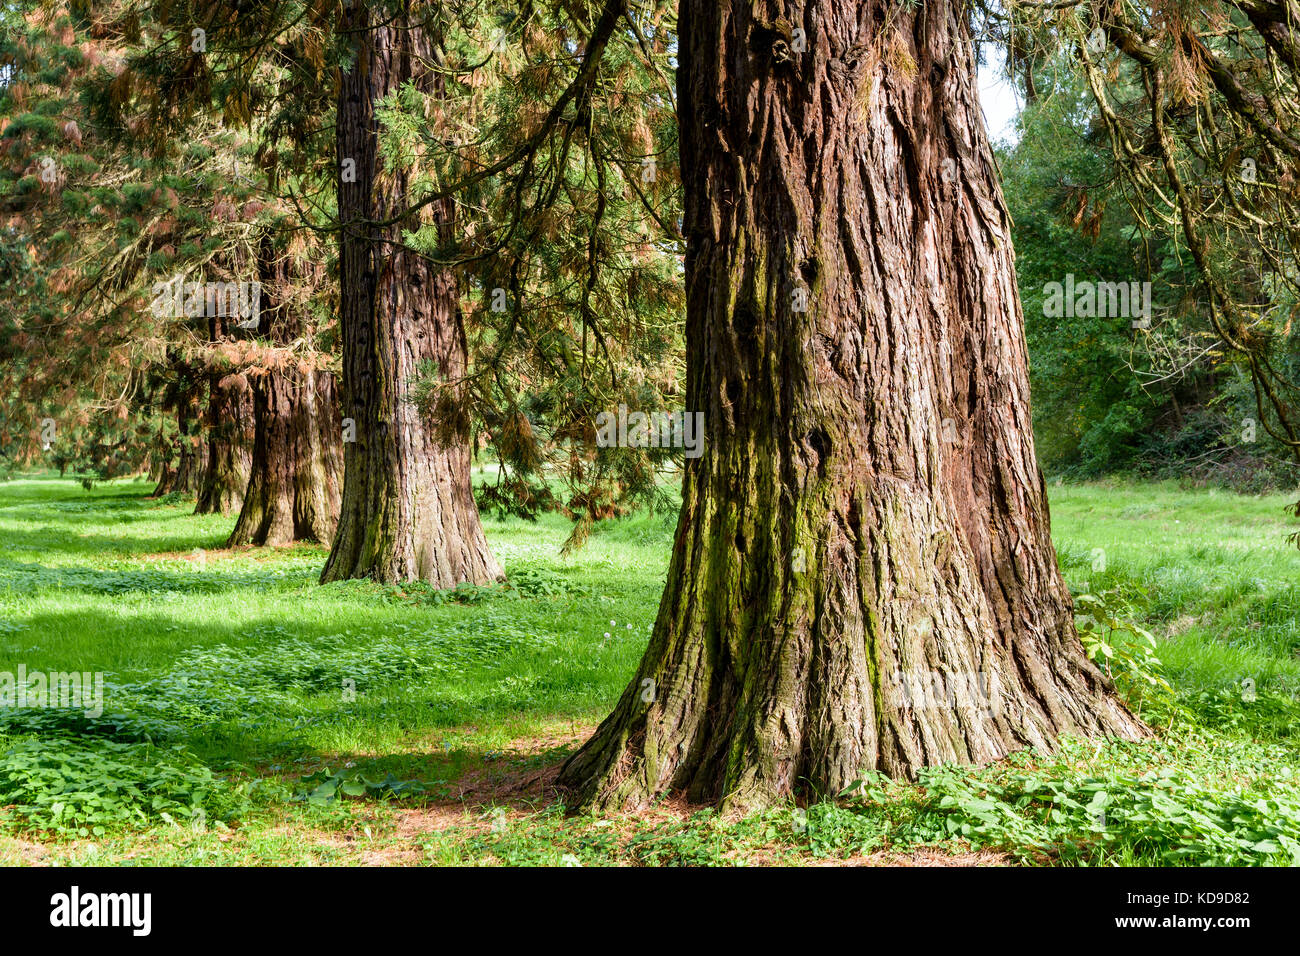 Alignment of giant sequoia trees. - Stock Image